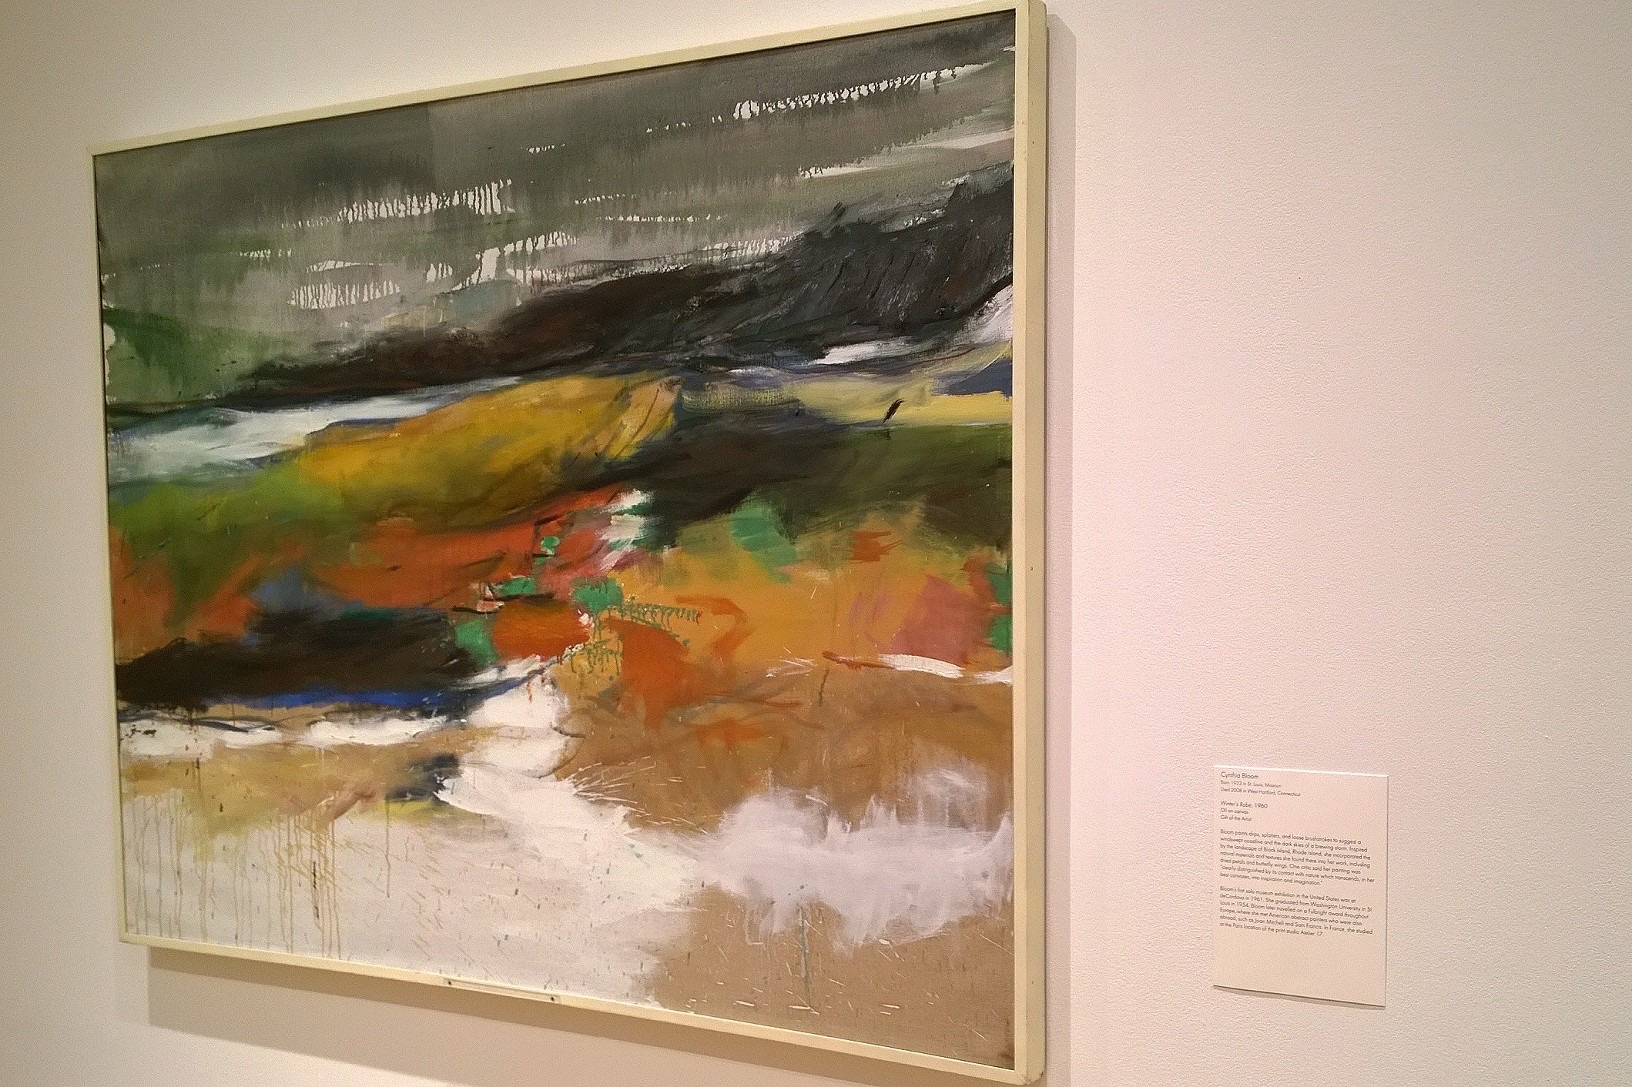 072117-Cynthia-Bloom-Block-Island-art